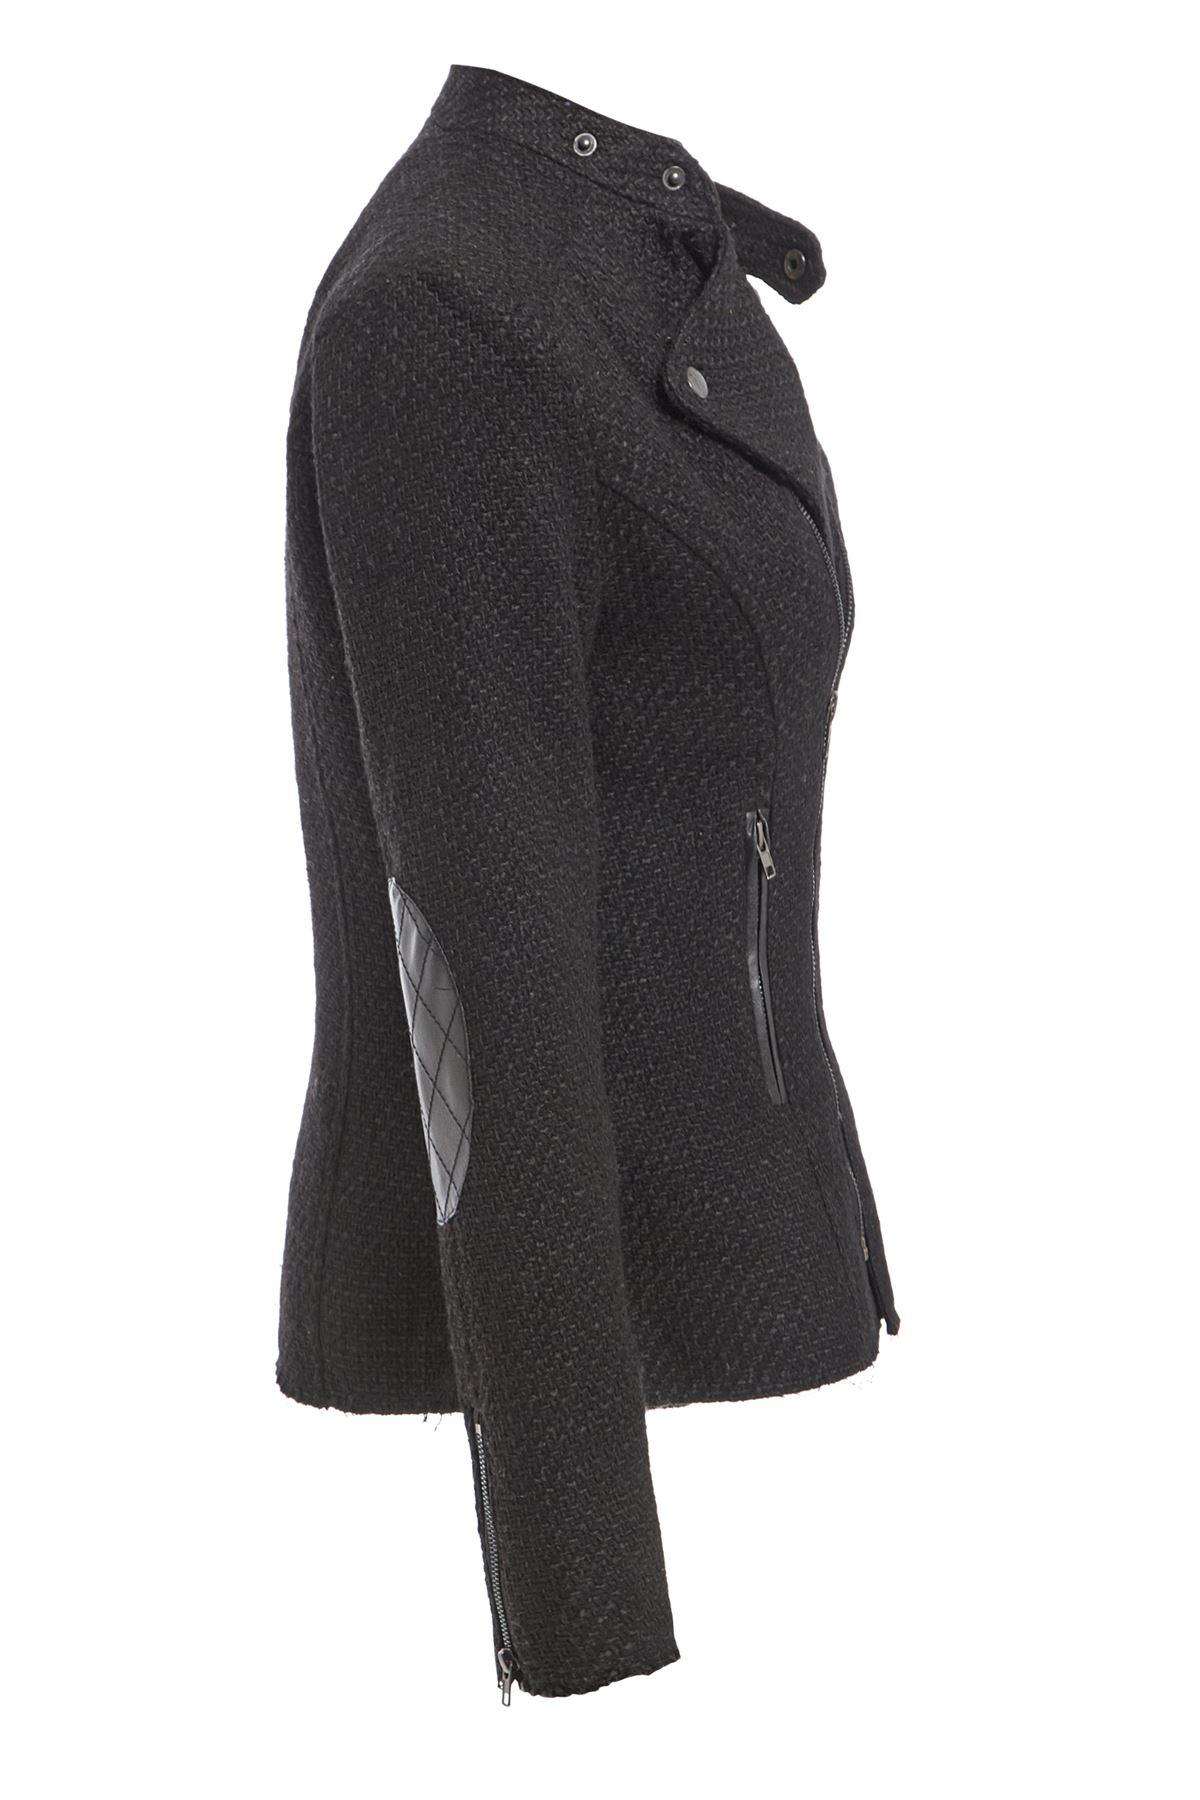 Womens-Wool-Blend-Blazer-Jacket-Ladies-Coat-Size-8-10-12-14-16-Black-New thumbnail 4